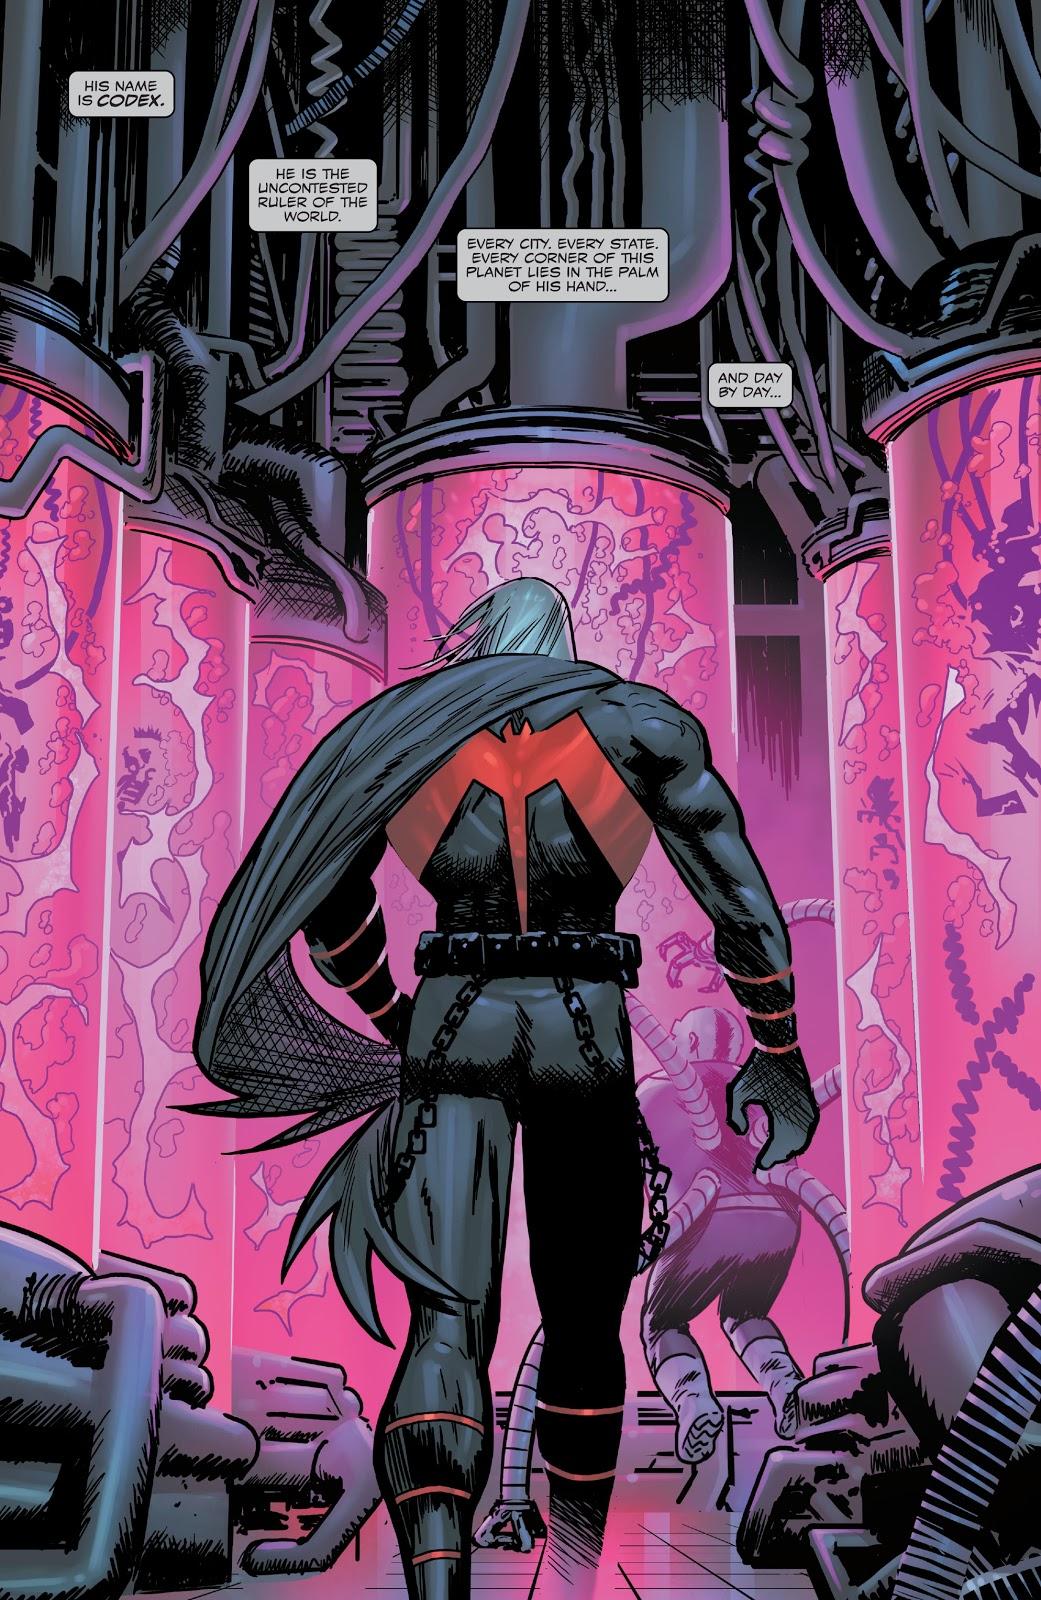 Codex (Venom Vol. 4 #28)